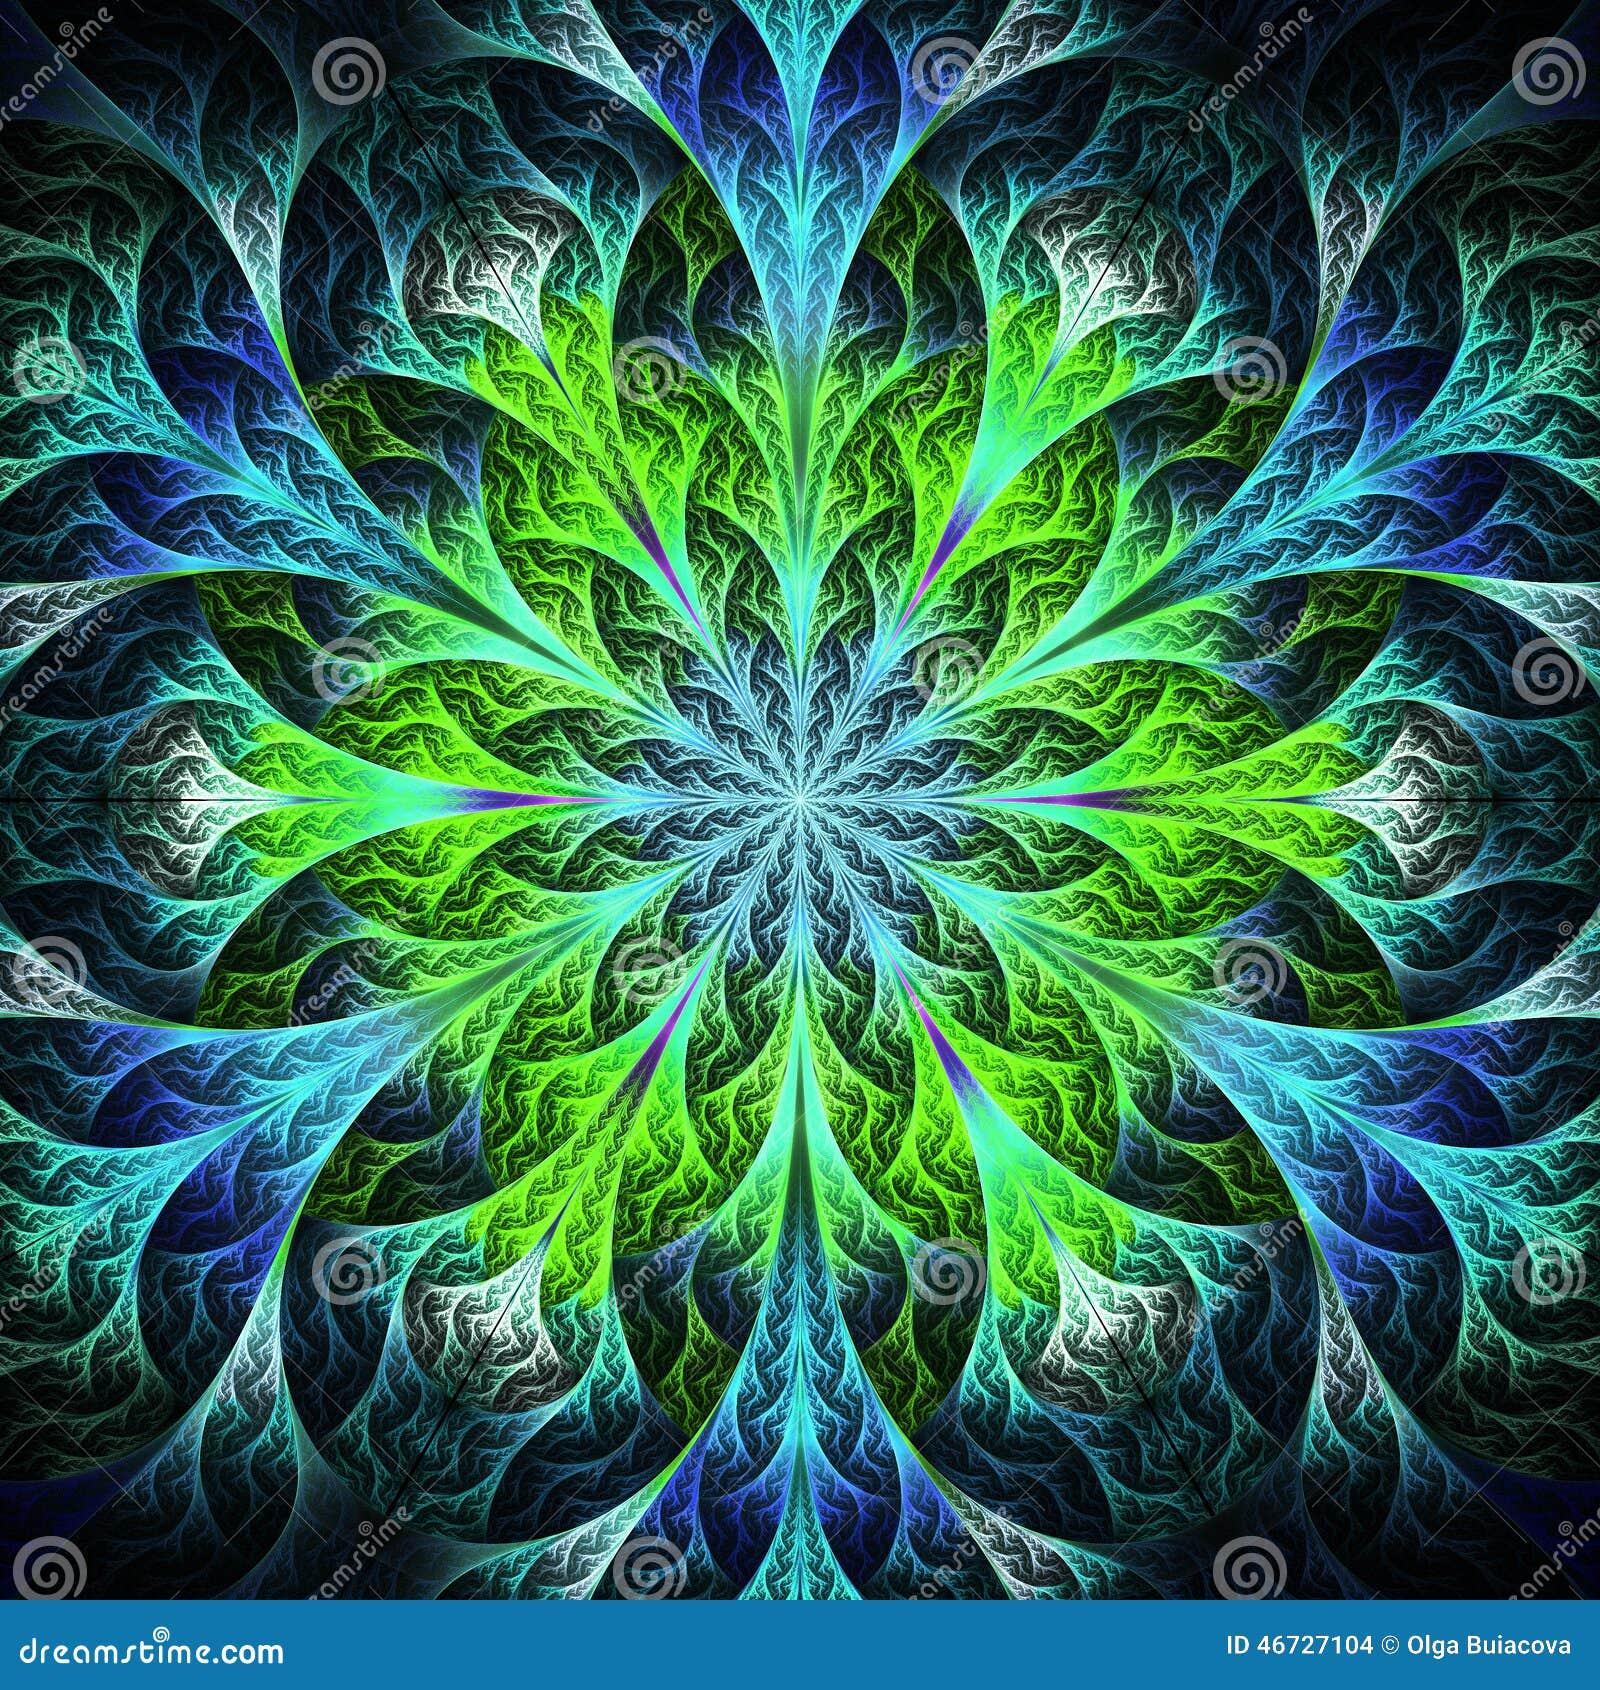 Fractal Black Flower Free Stock Photo: Beautiful Fractal Flower In Black, Blue And Green